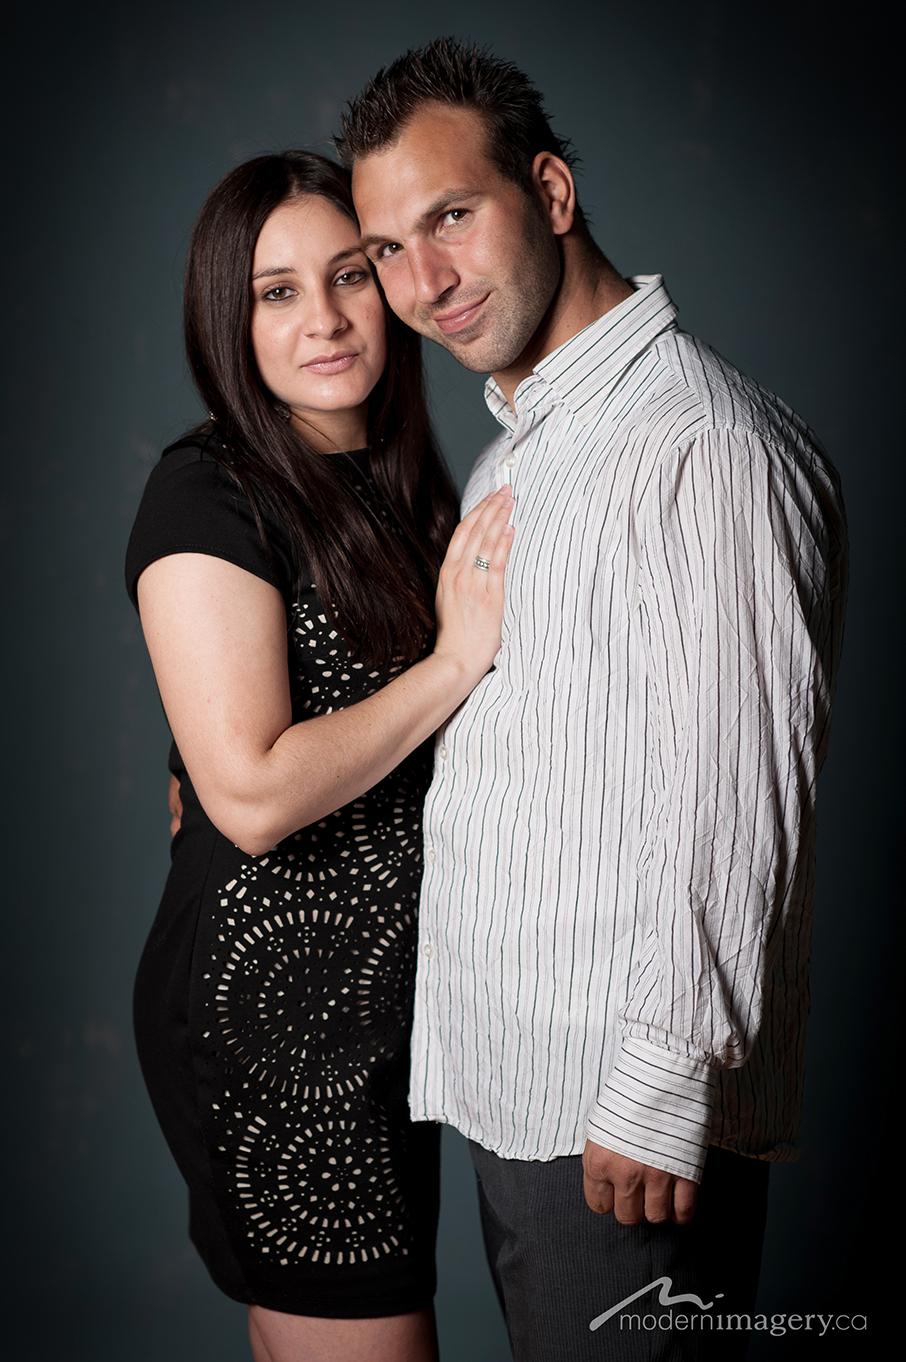 Rita&Tomasso-40.jpg